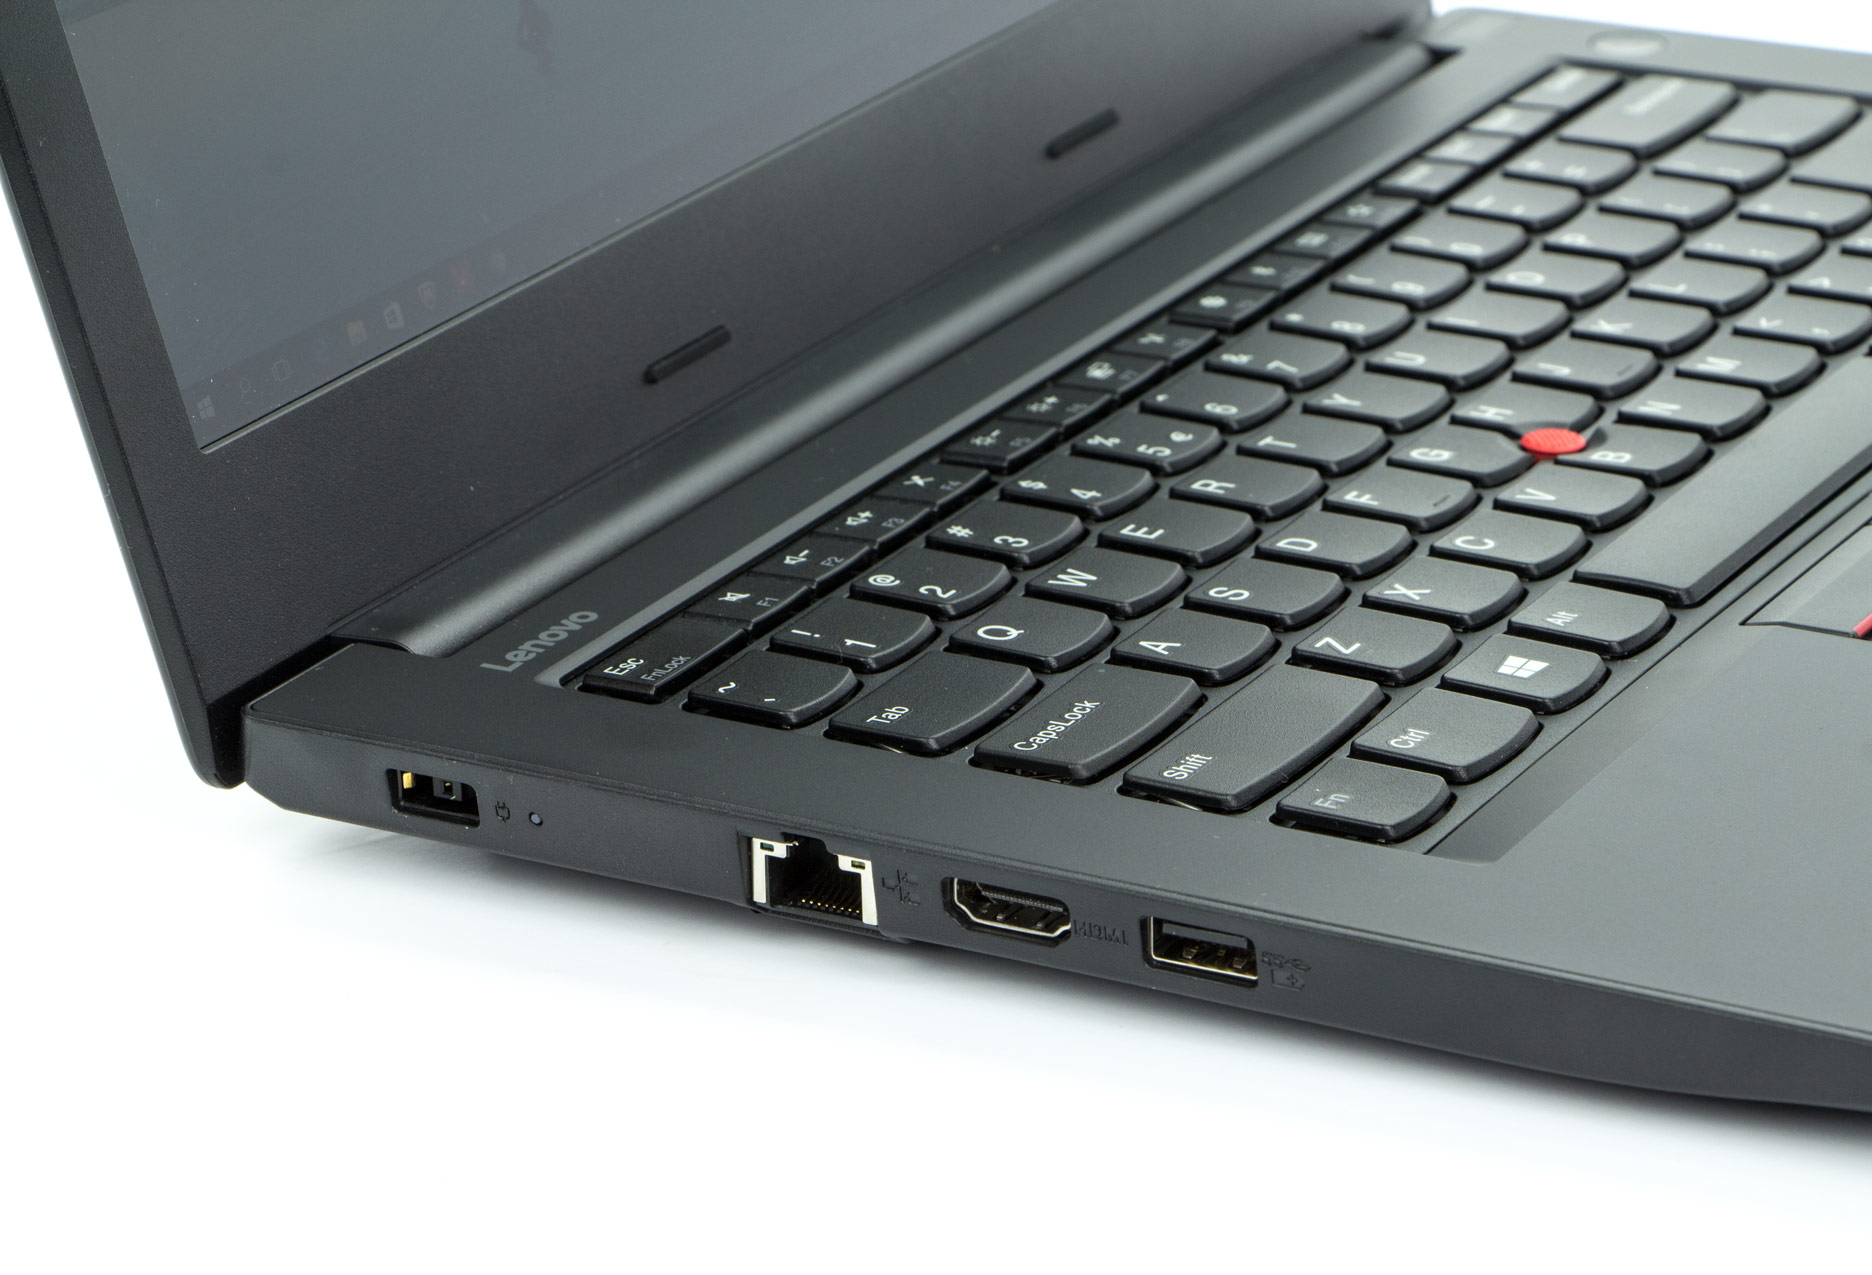 Lenovo ThinkPad E470 lewy bok